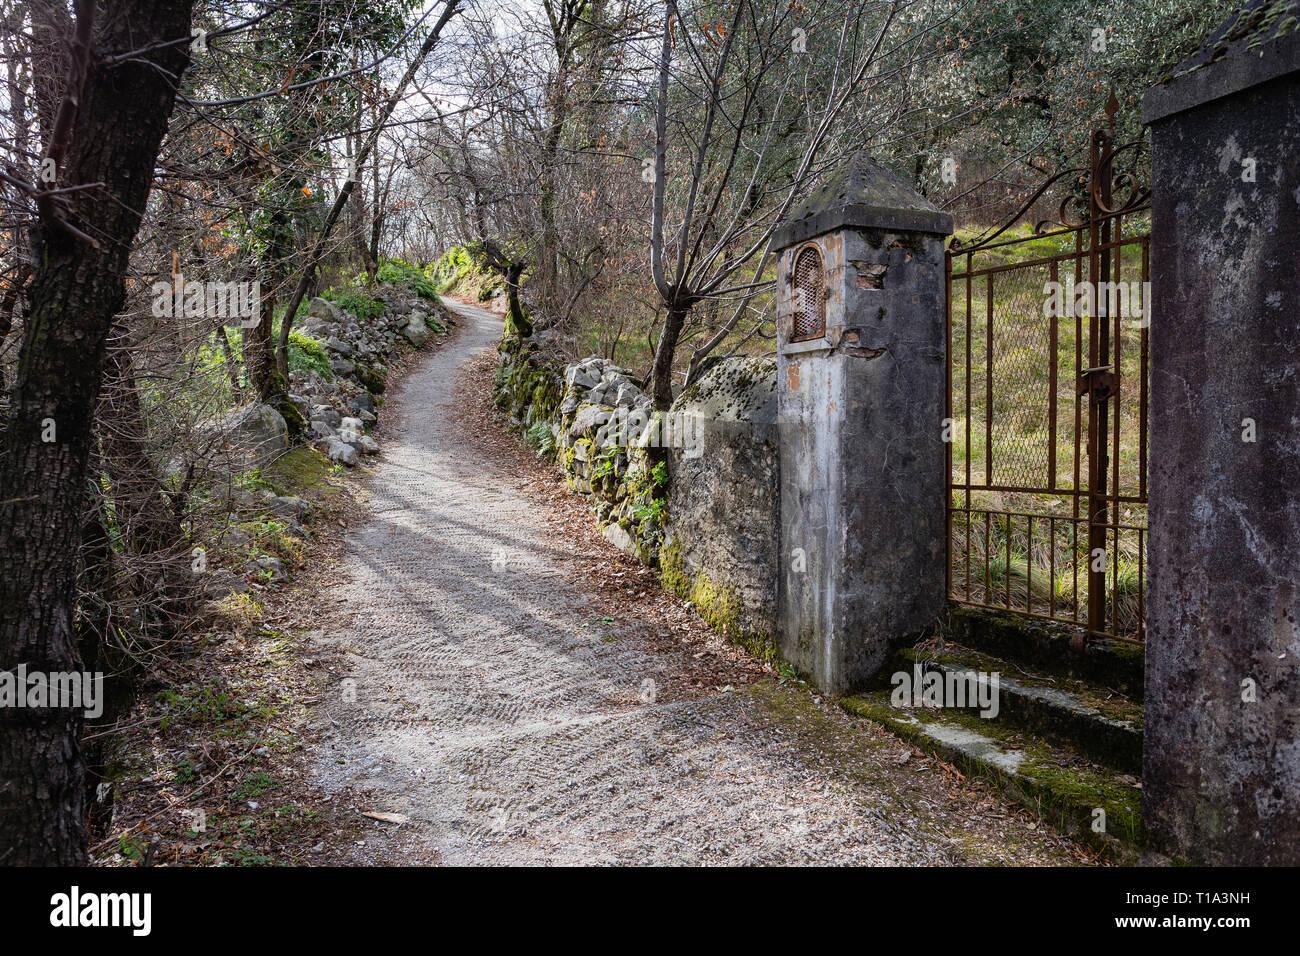 Pathway on Mote Isola island, Lake Iseo, Lombardy, Italy - Stock Image